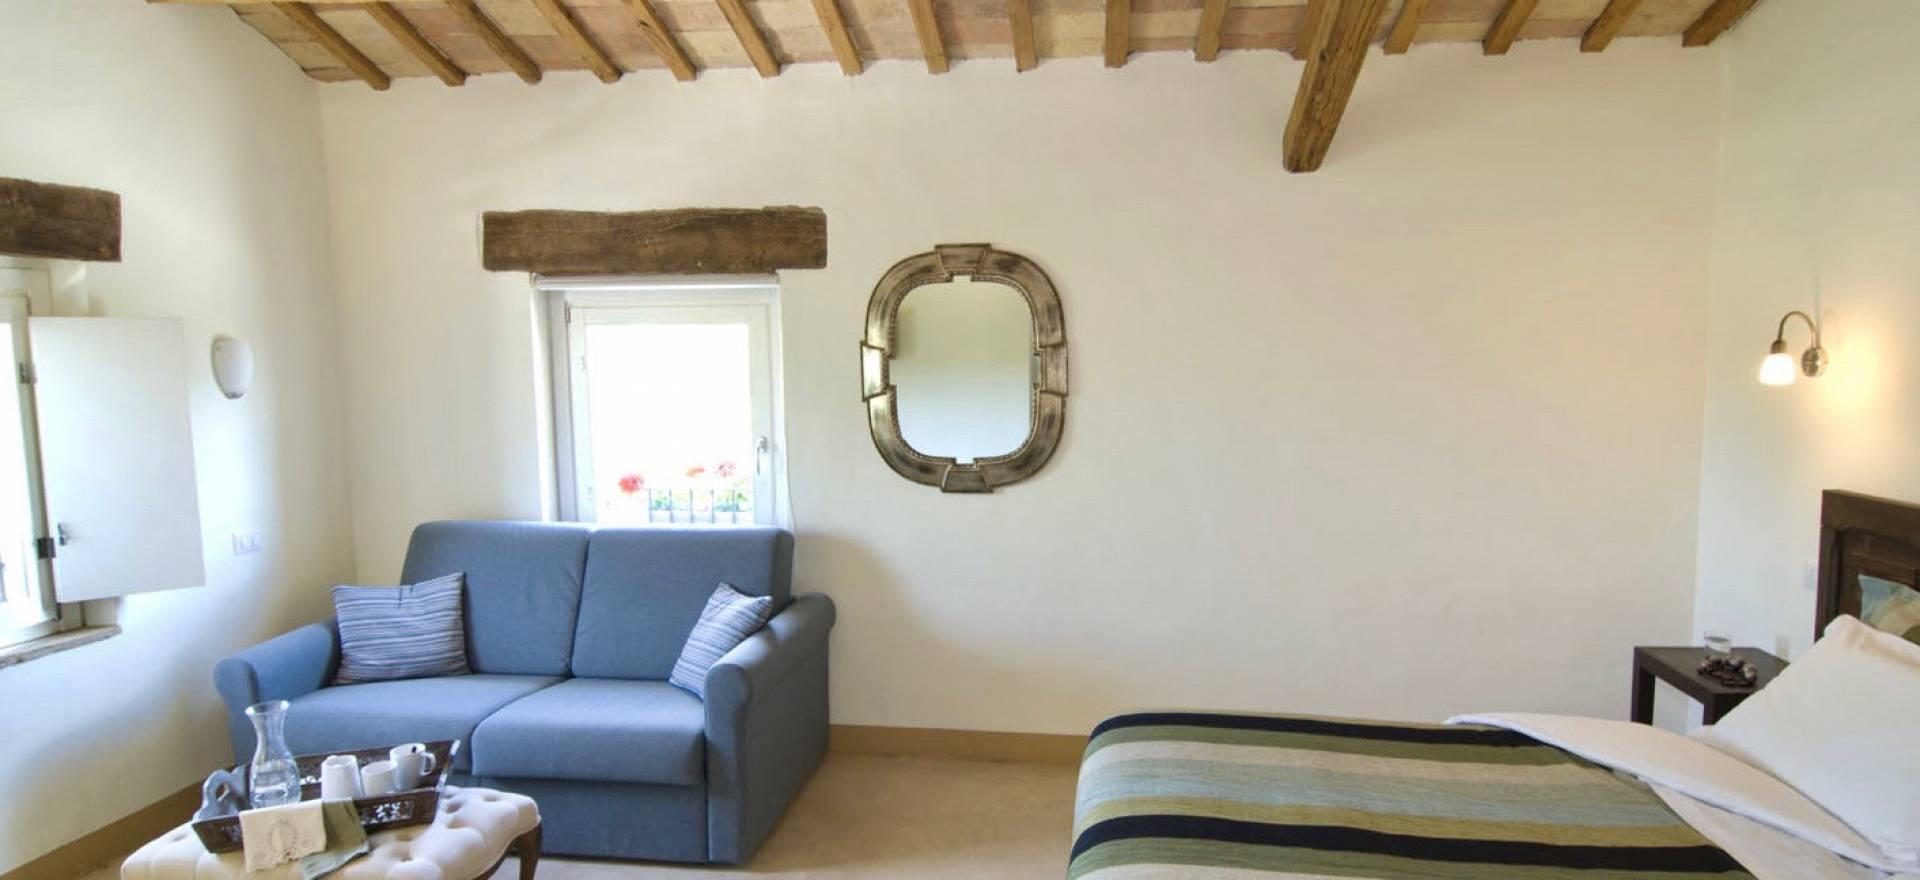 Agriturismo le Marche, mooie kamers en gastvrij